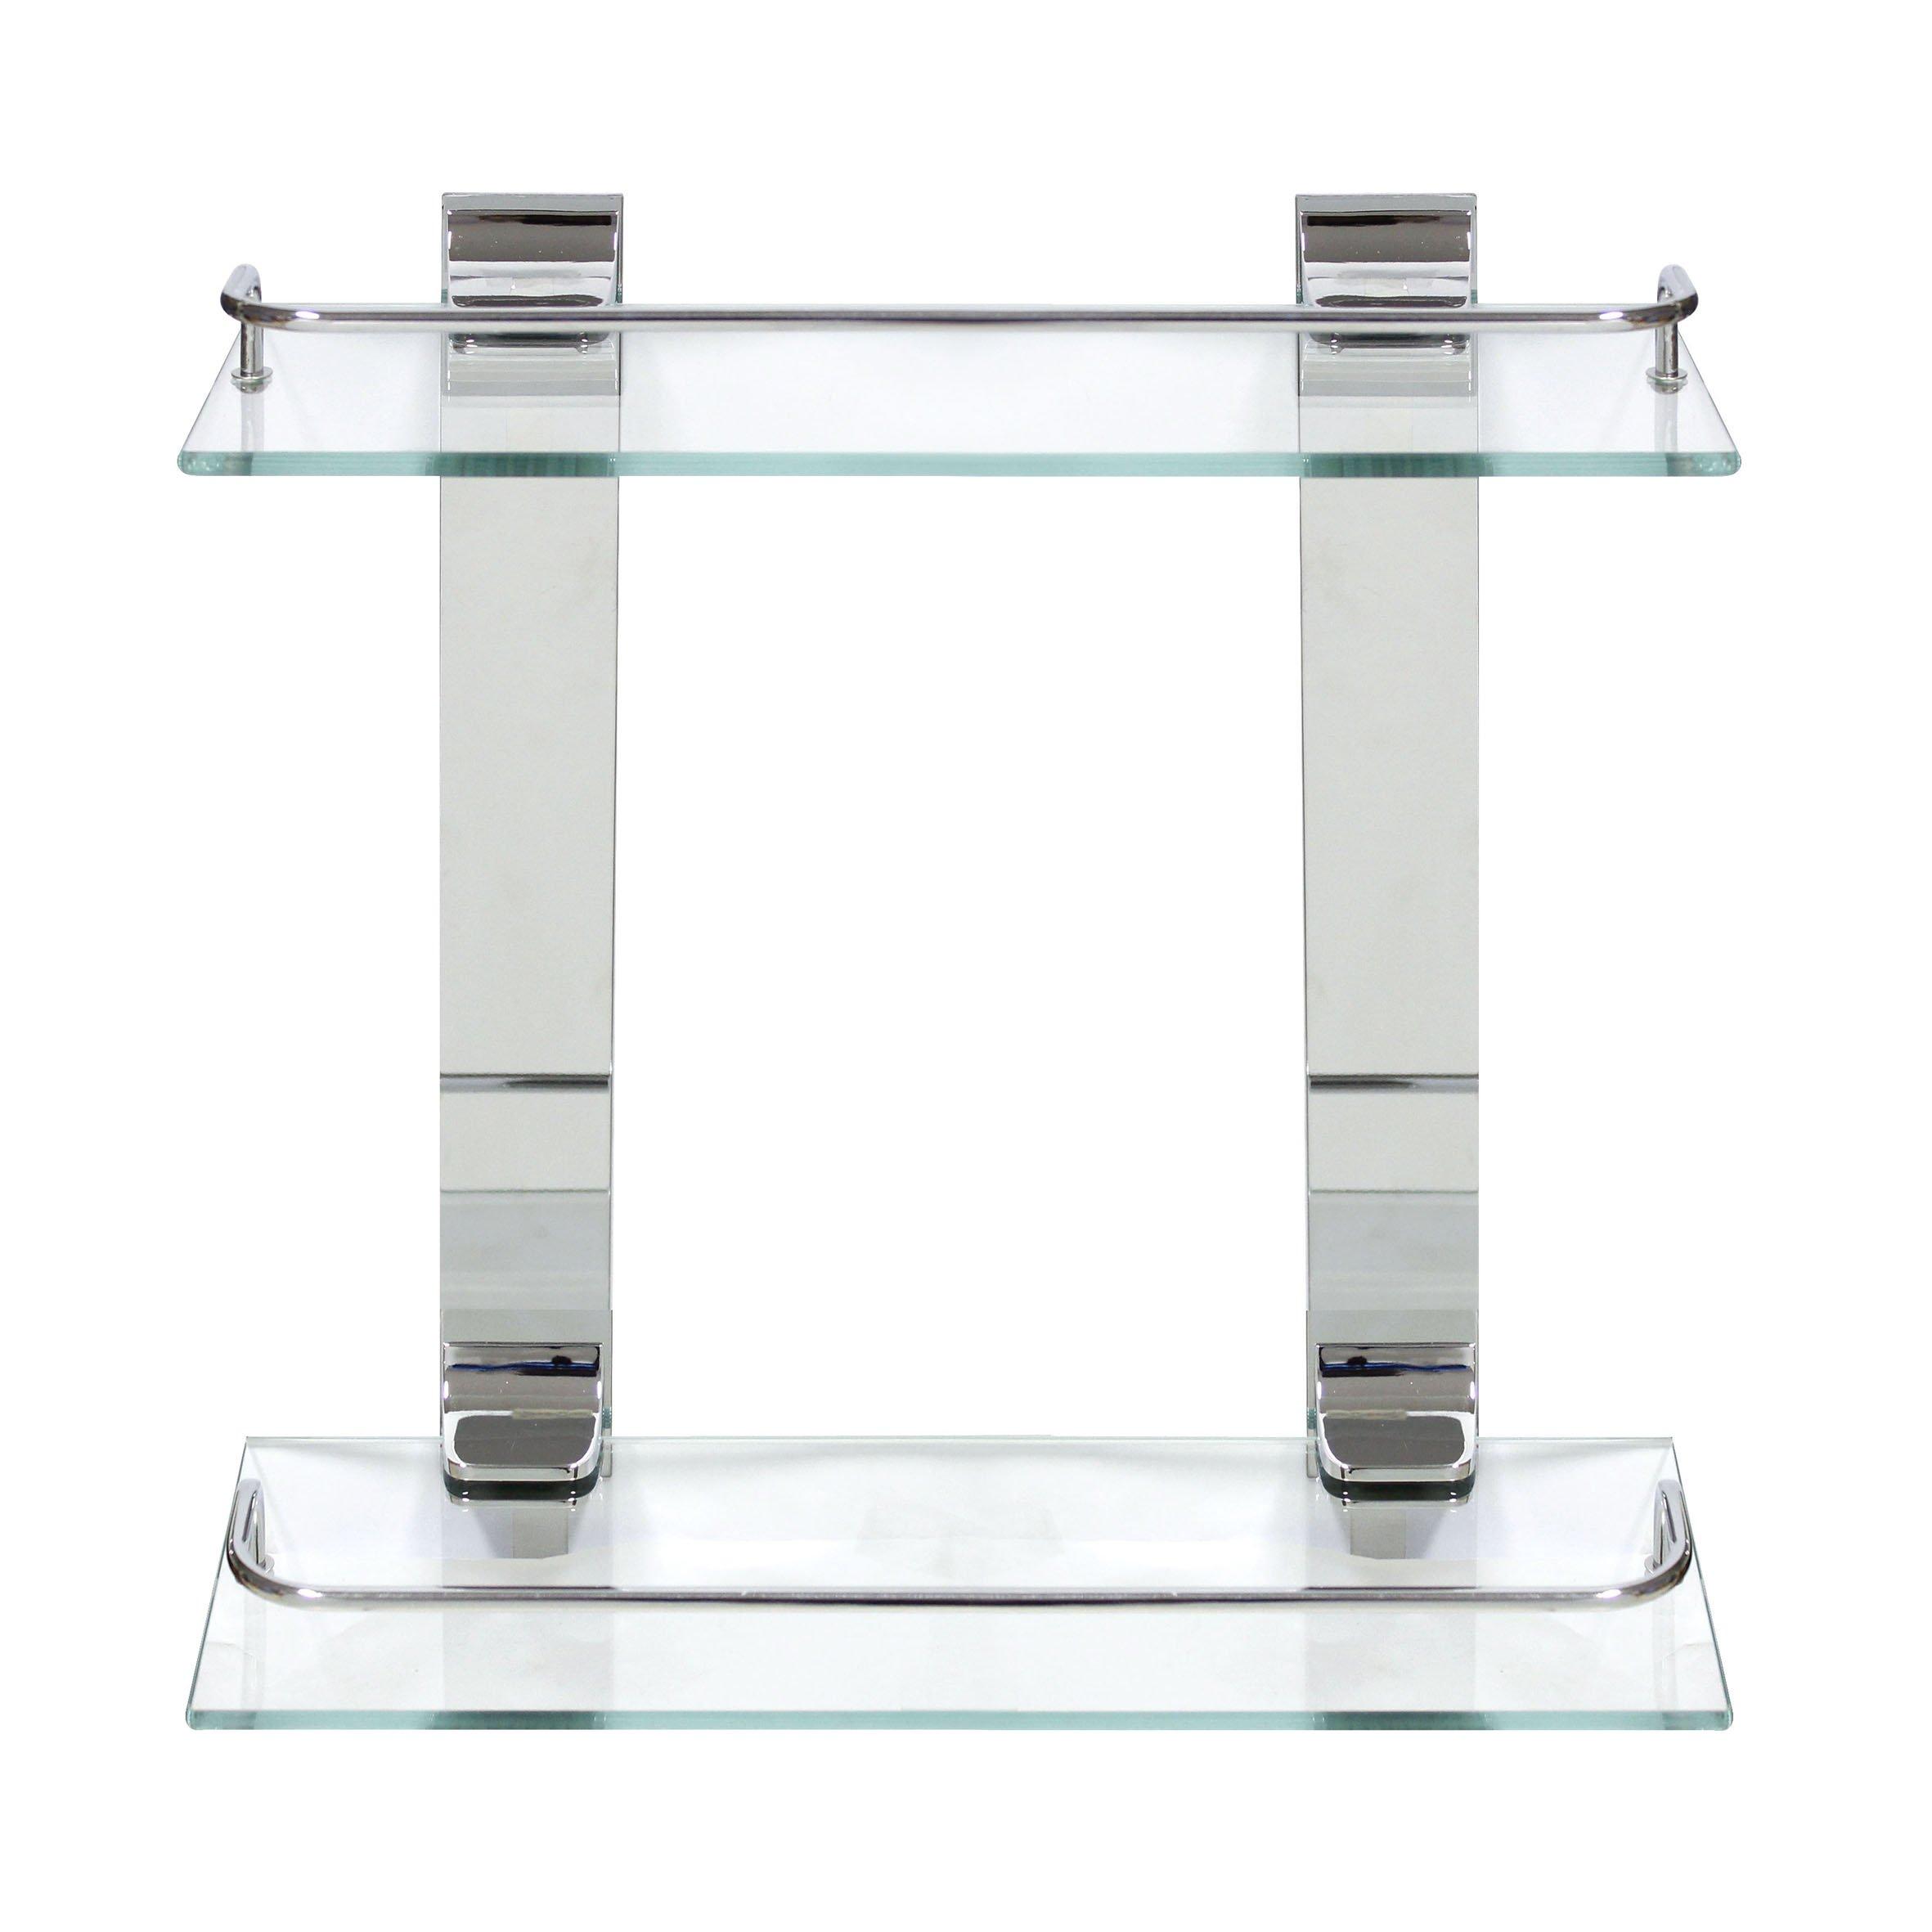 MODONA Double Glass Wall Shelf with Rail - Polished Chrome - 5 Year Warrantee